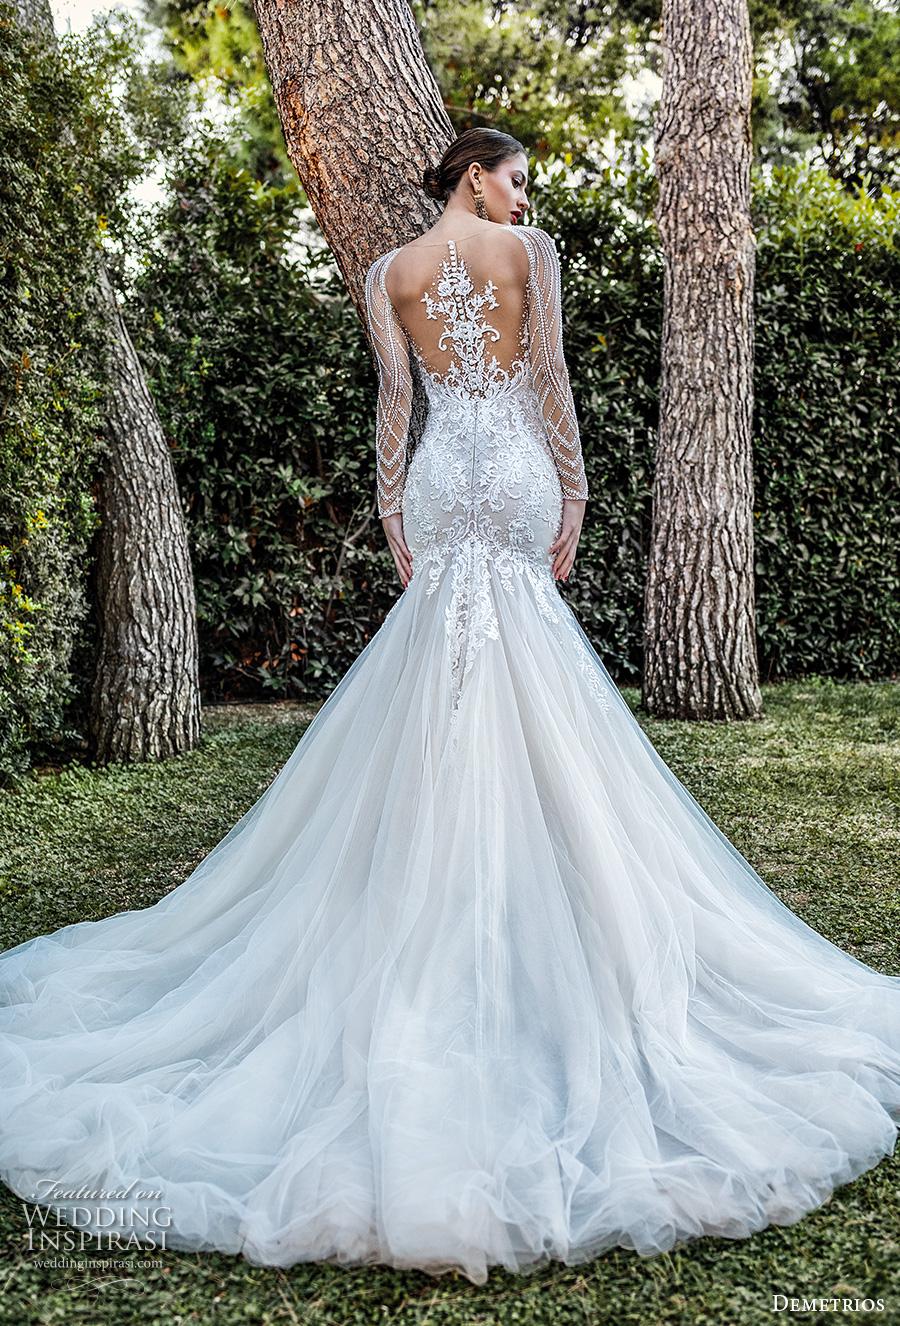 demetrios 2020 bridal long sleeves illusion bateau sweetheart neckline heavily embellished bodice elegant mermaid wedding dress sheer lace back chapel train (8) bv